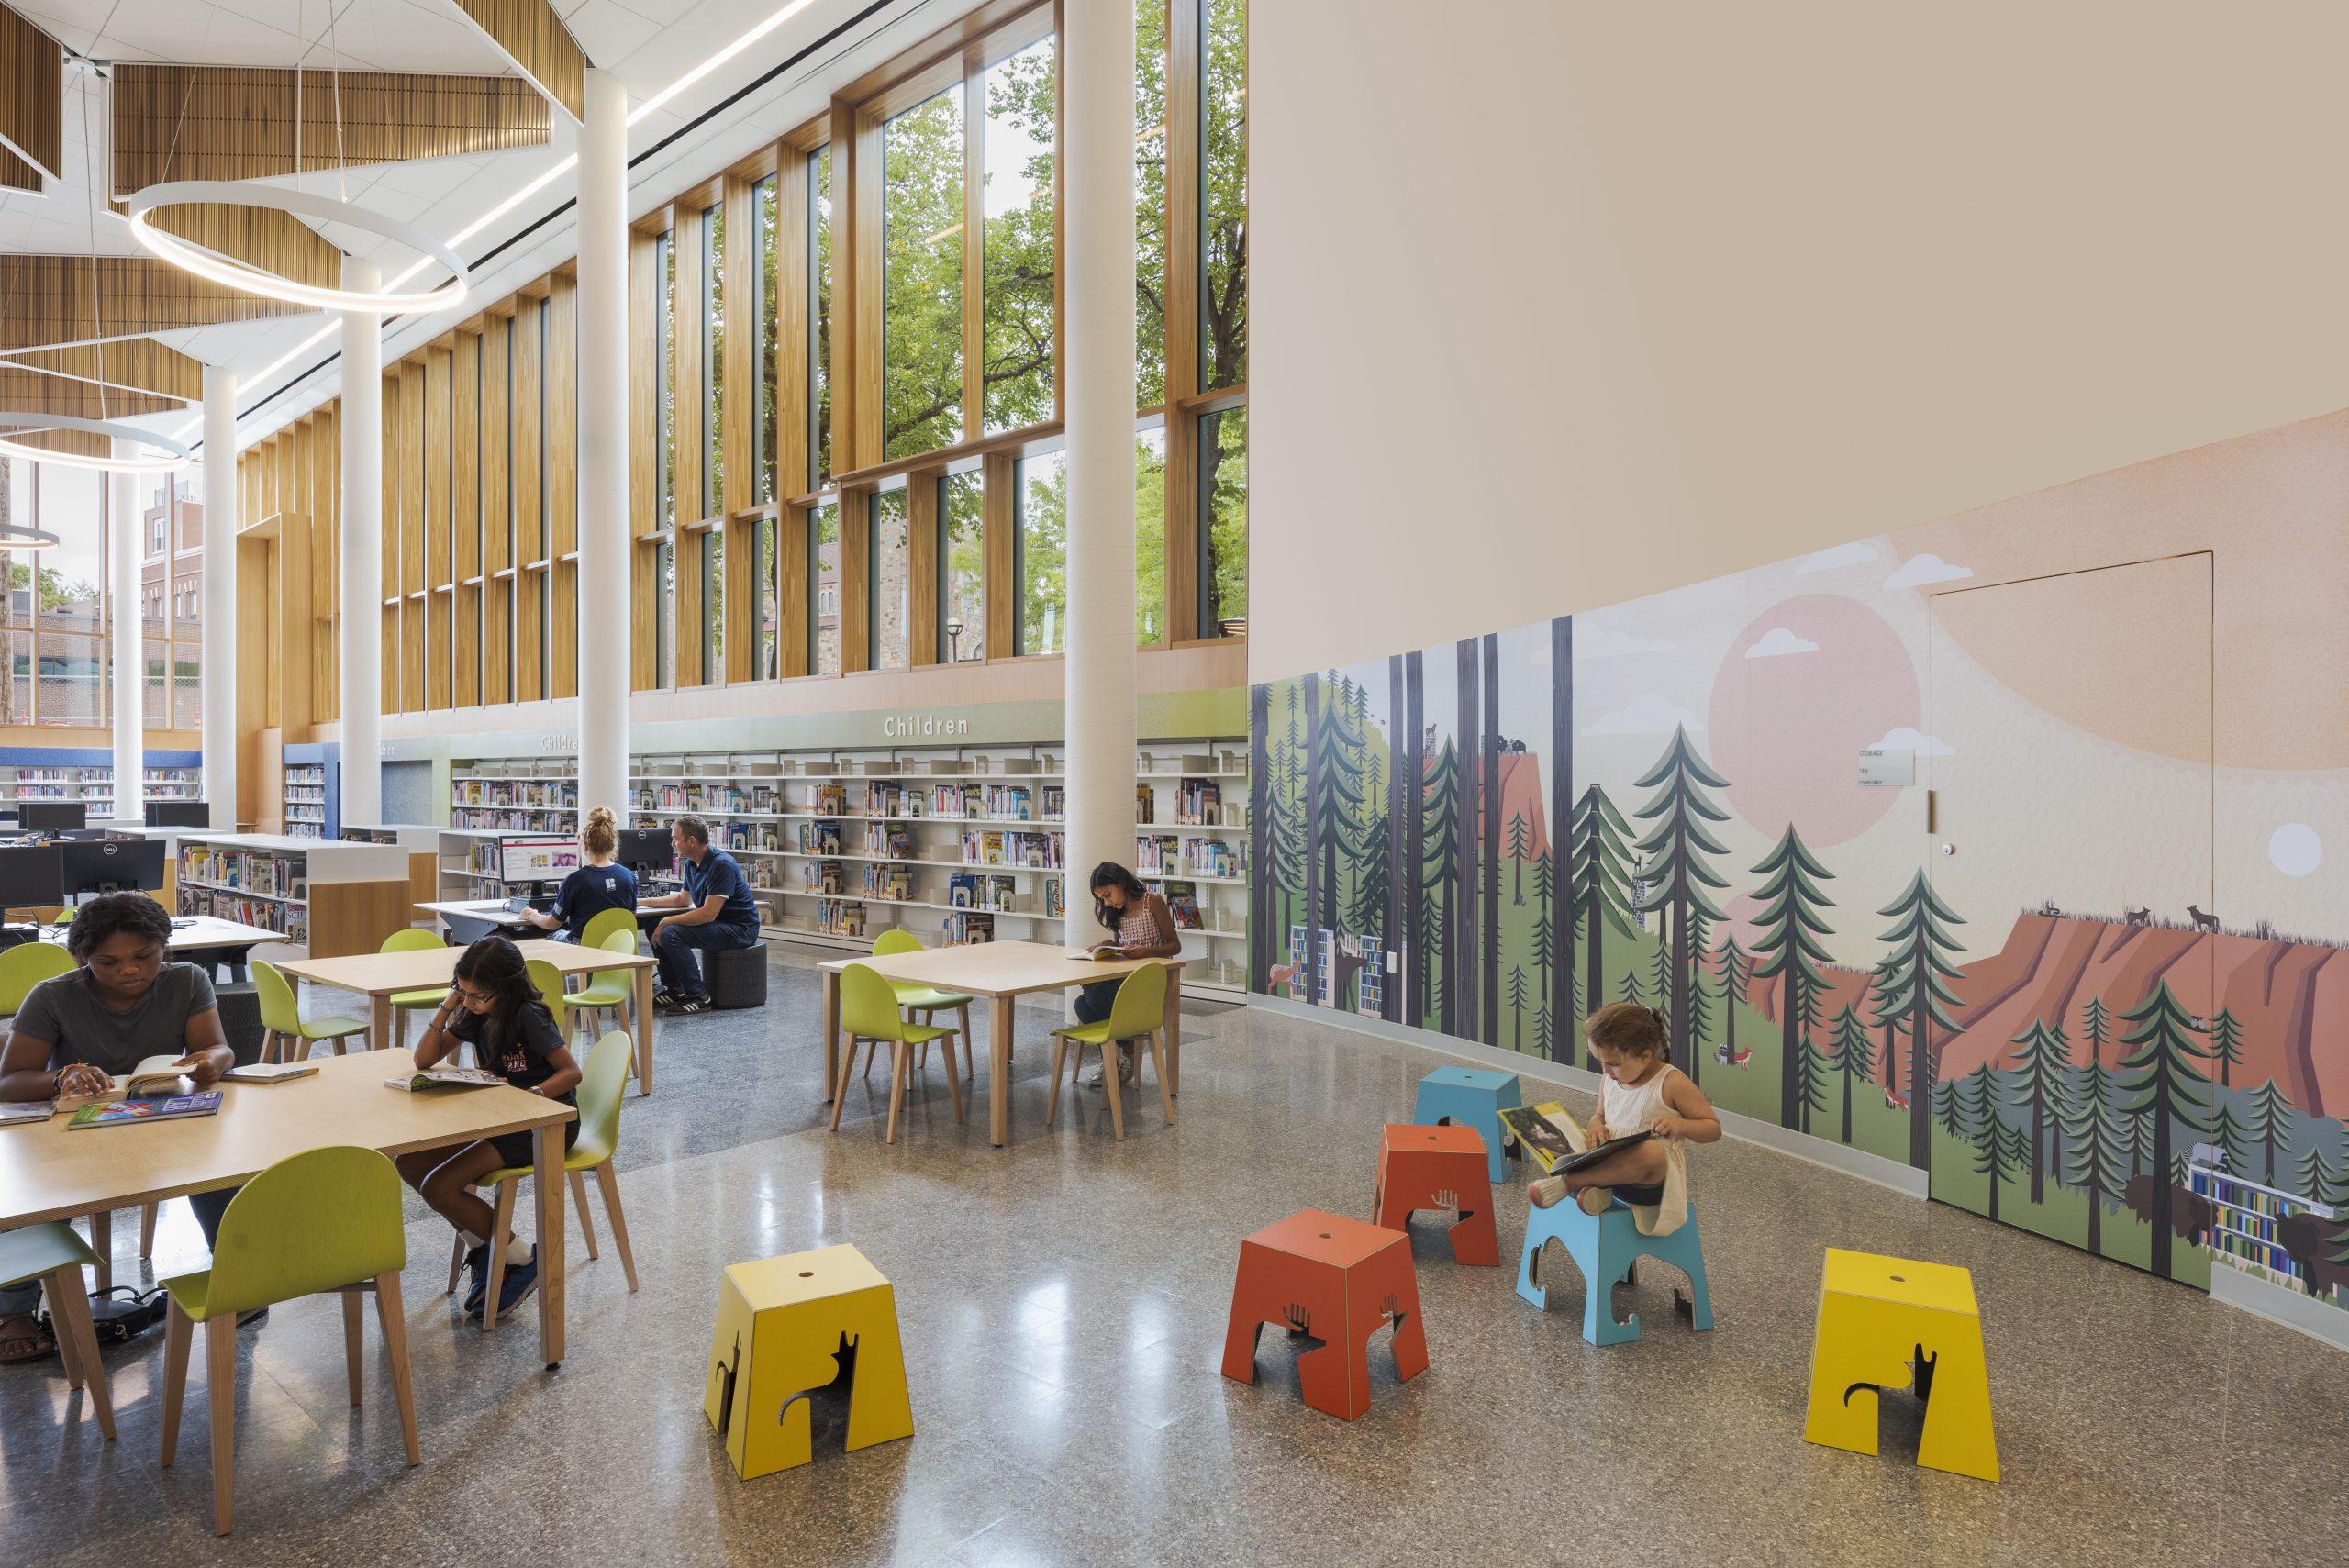 Roxbury Branch of the Boston Public Library Renovation wins 2021 AIA/ALA Library Building Award!